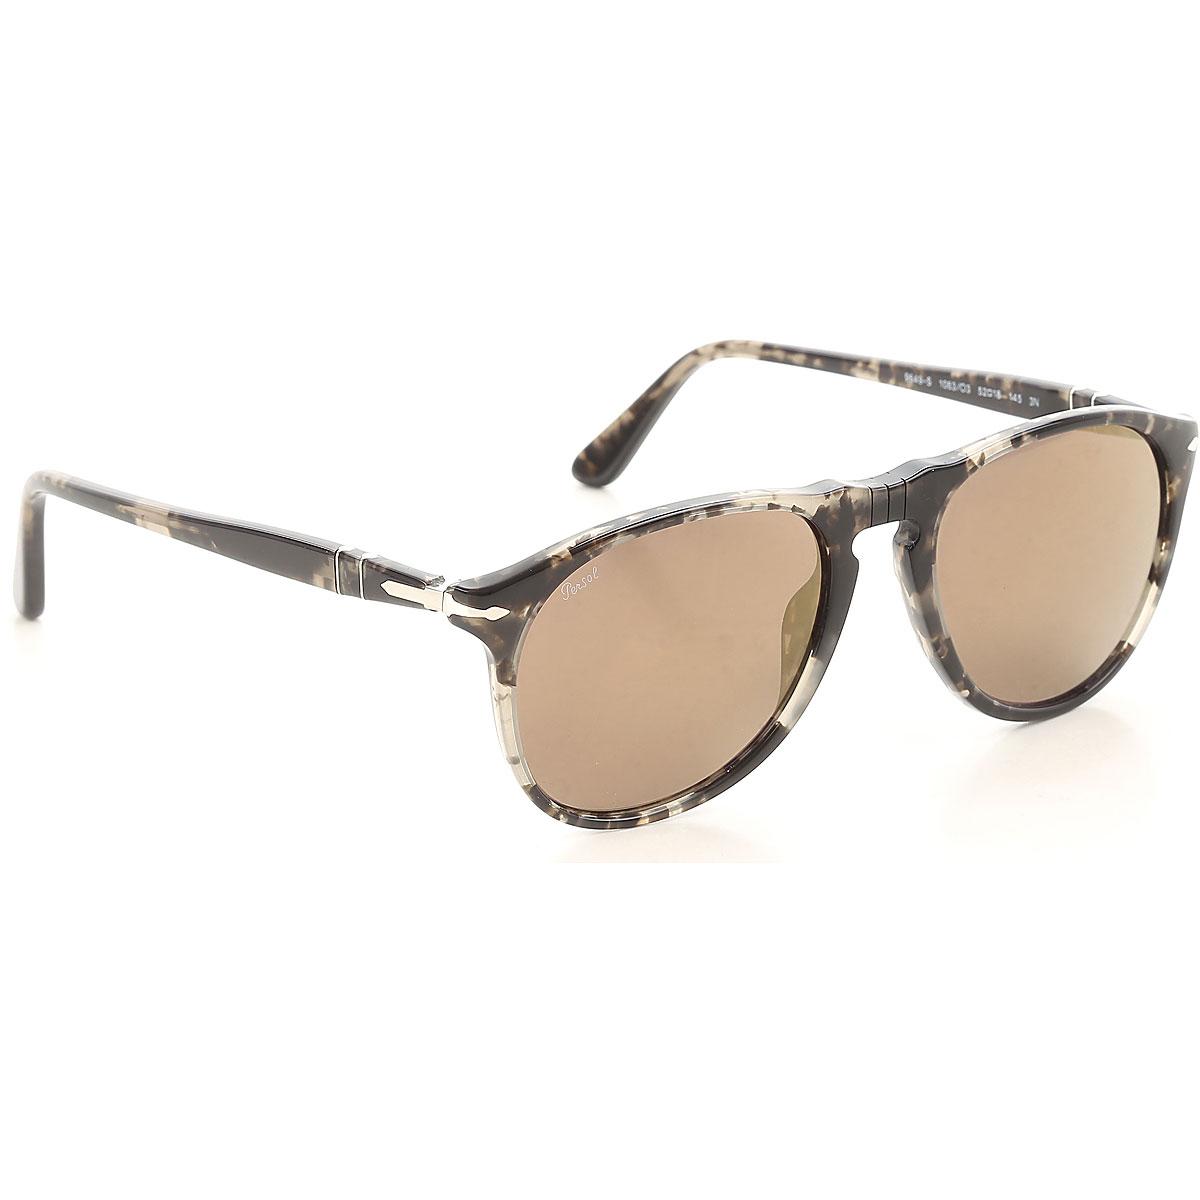 Persol Sunglasses On Sale, Smoky Havana, 2019